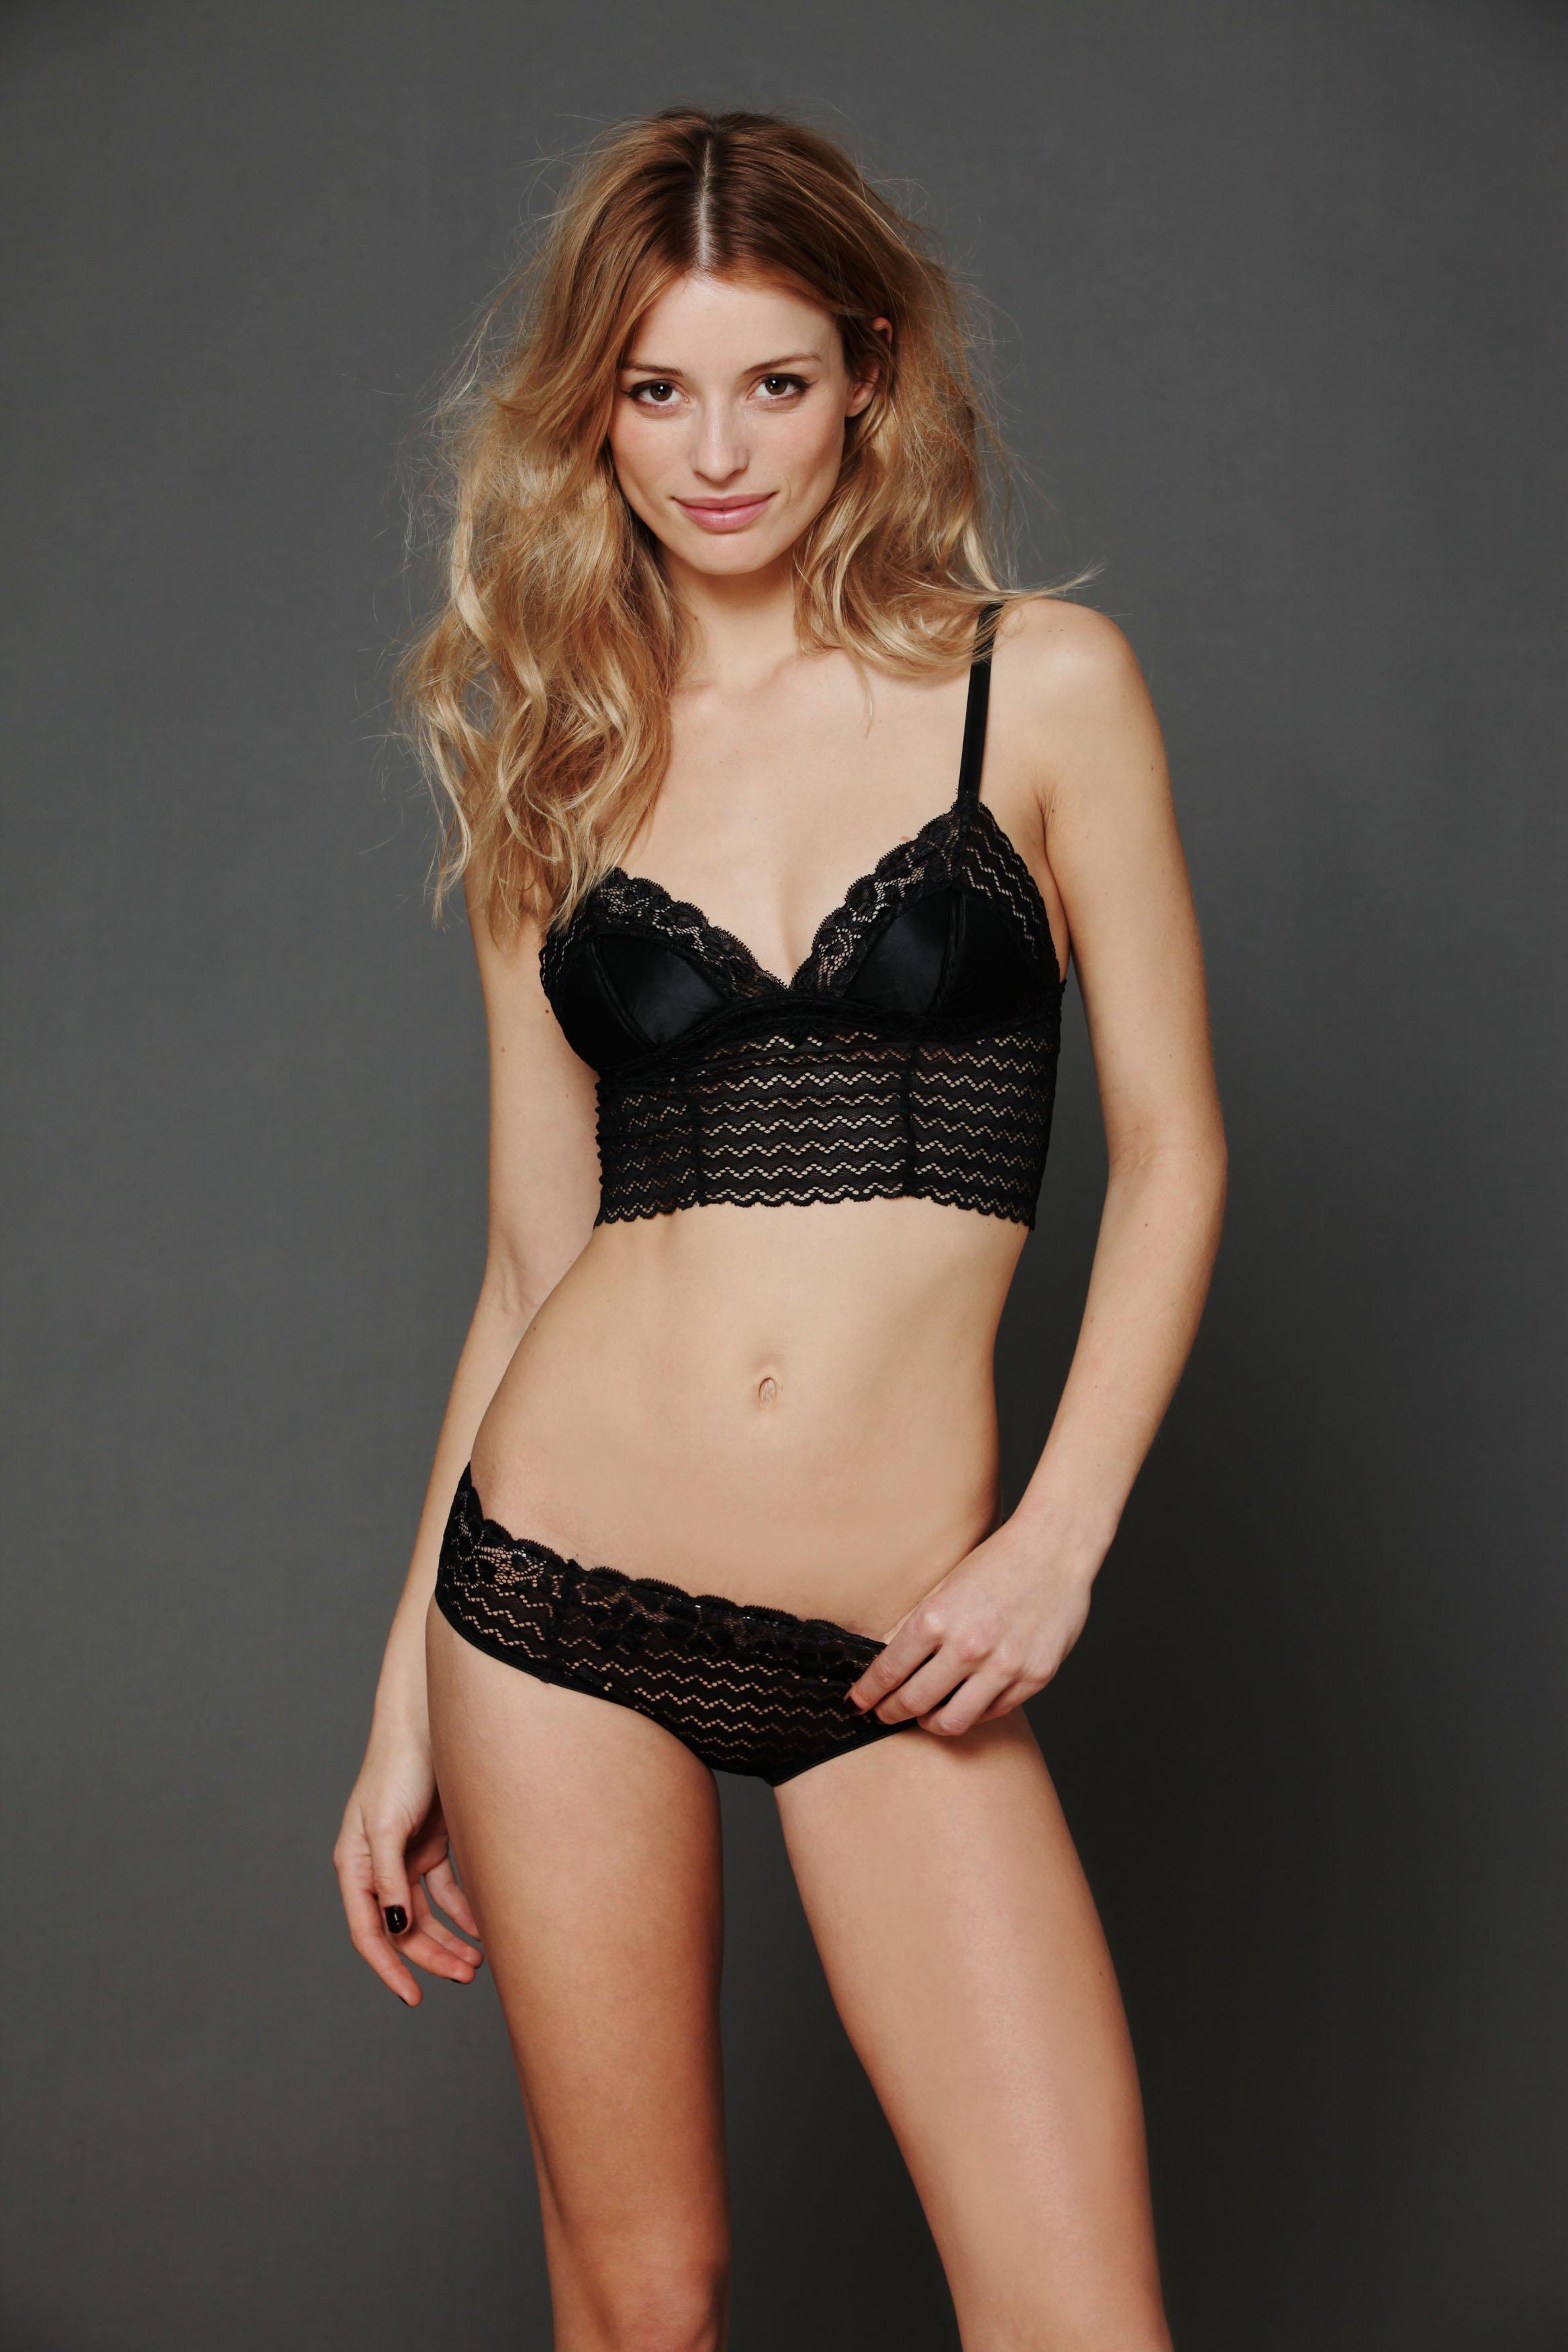 Flavia Playboy flavia lucini – freepeople photoshoot 2012 | lingerie tribute